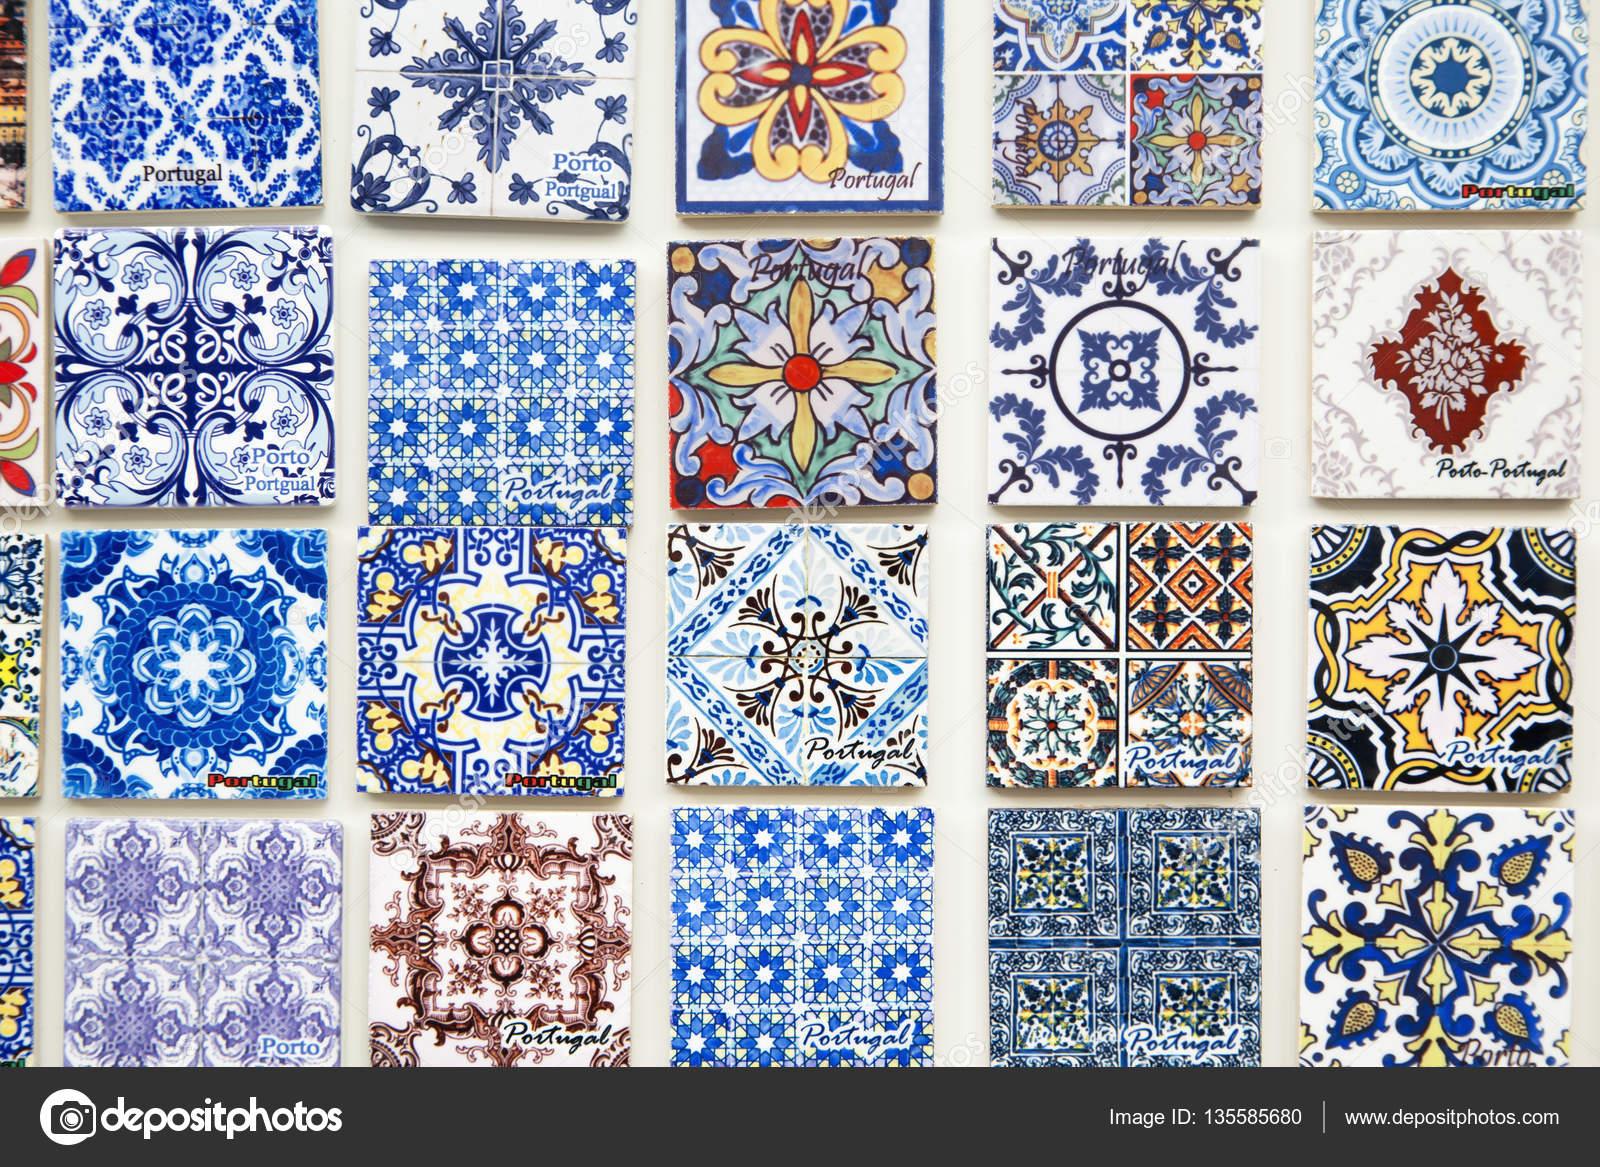 Touristische souvenirs reproduzieren portugiesische kacheln in porto redaktionelles stockfoto - Azulejos portugueses comprar ...